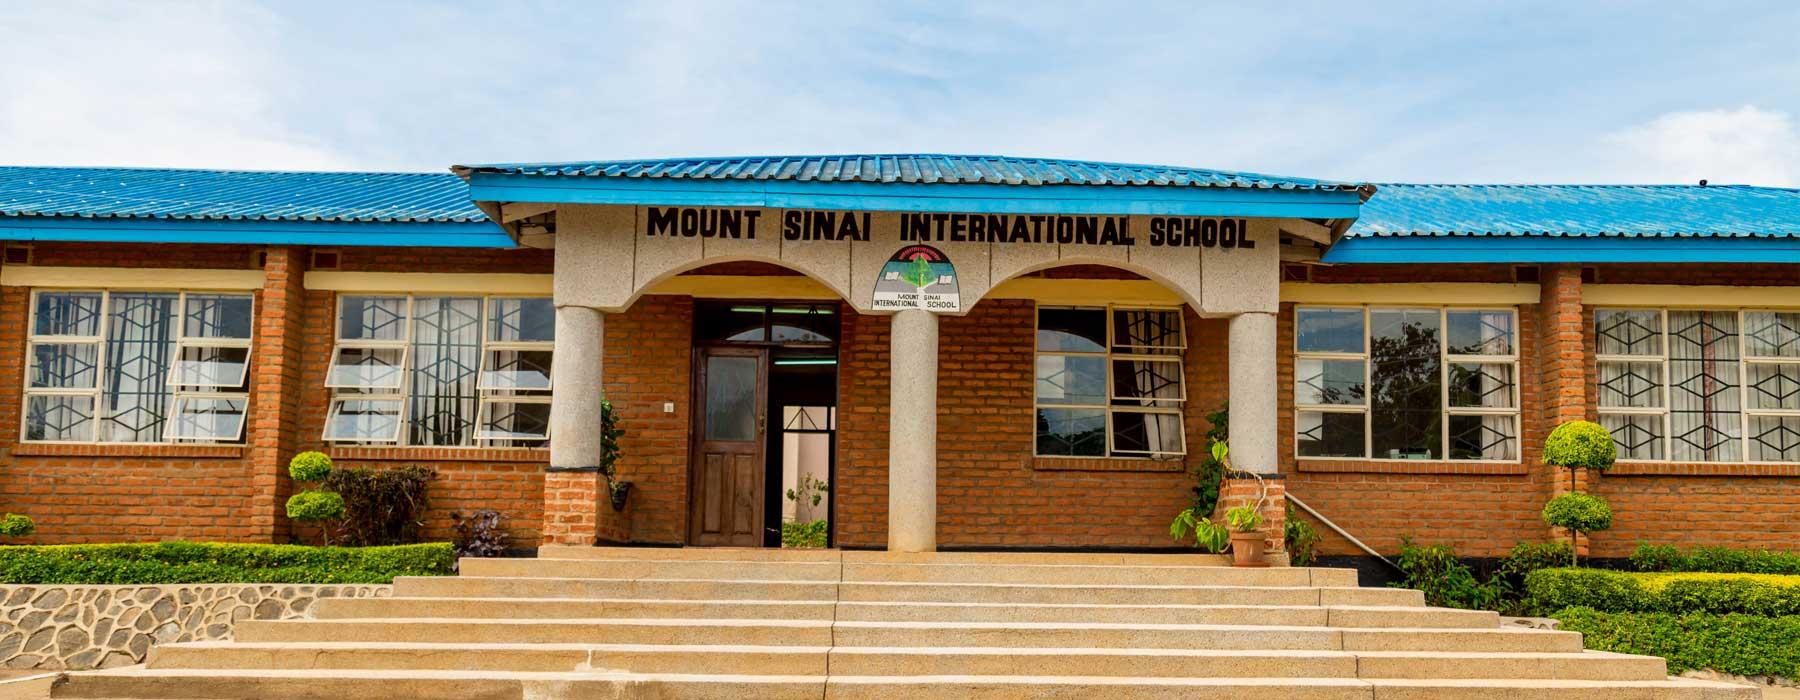 Mount Sinai International School